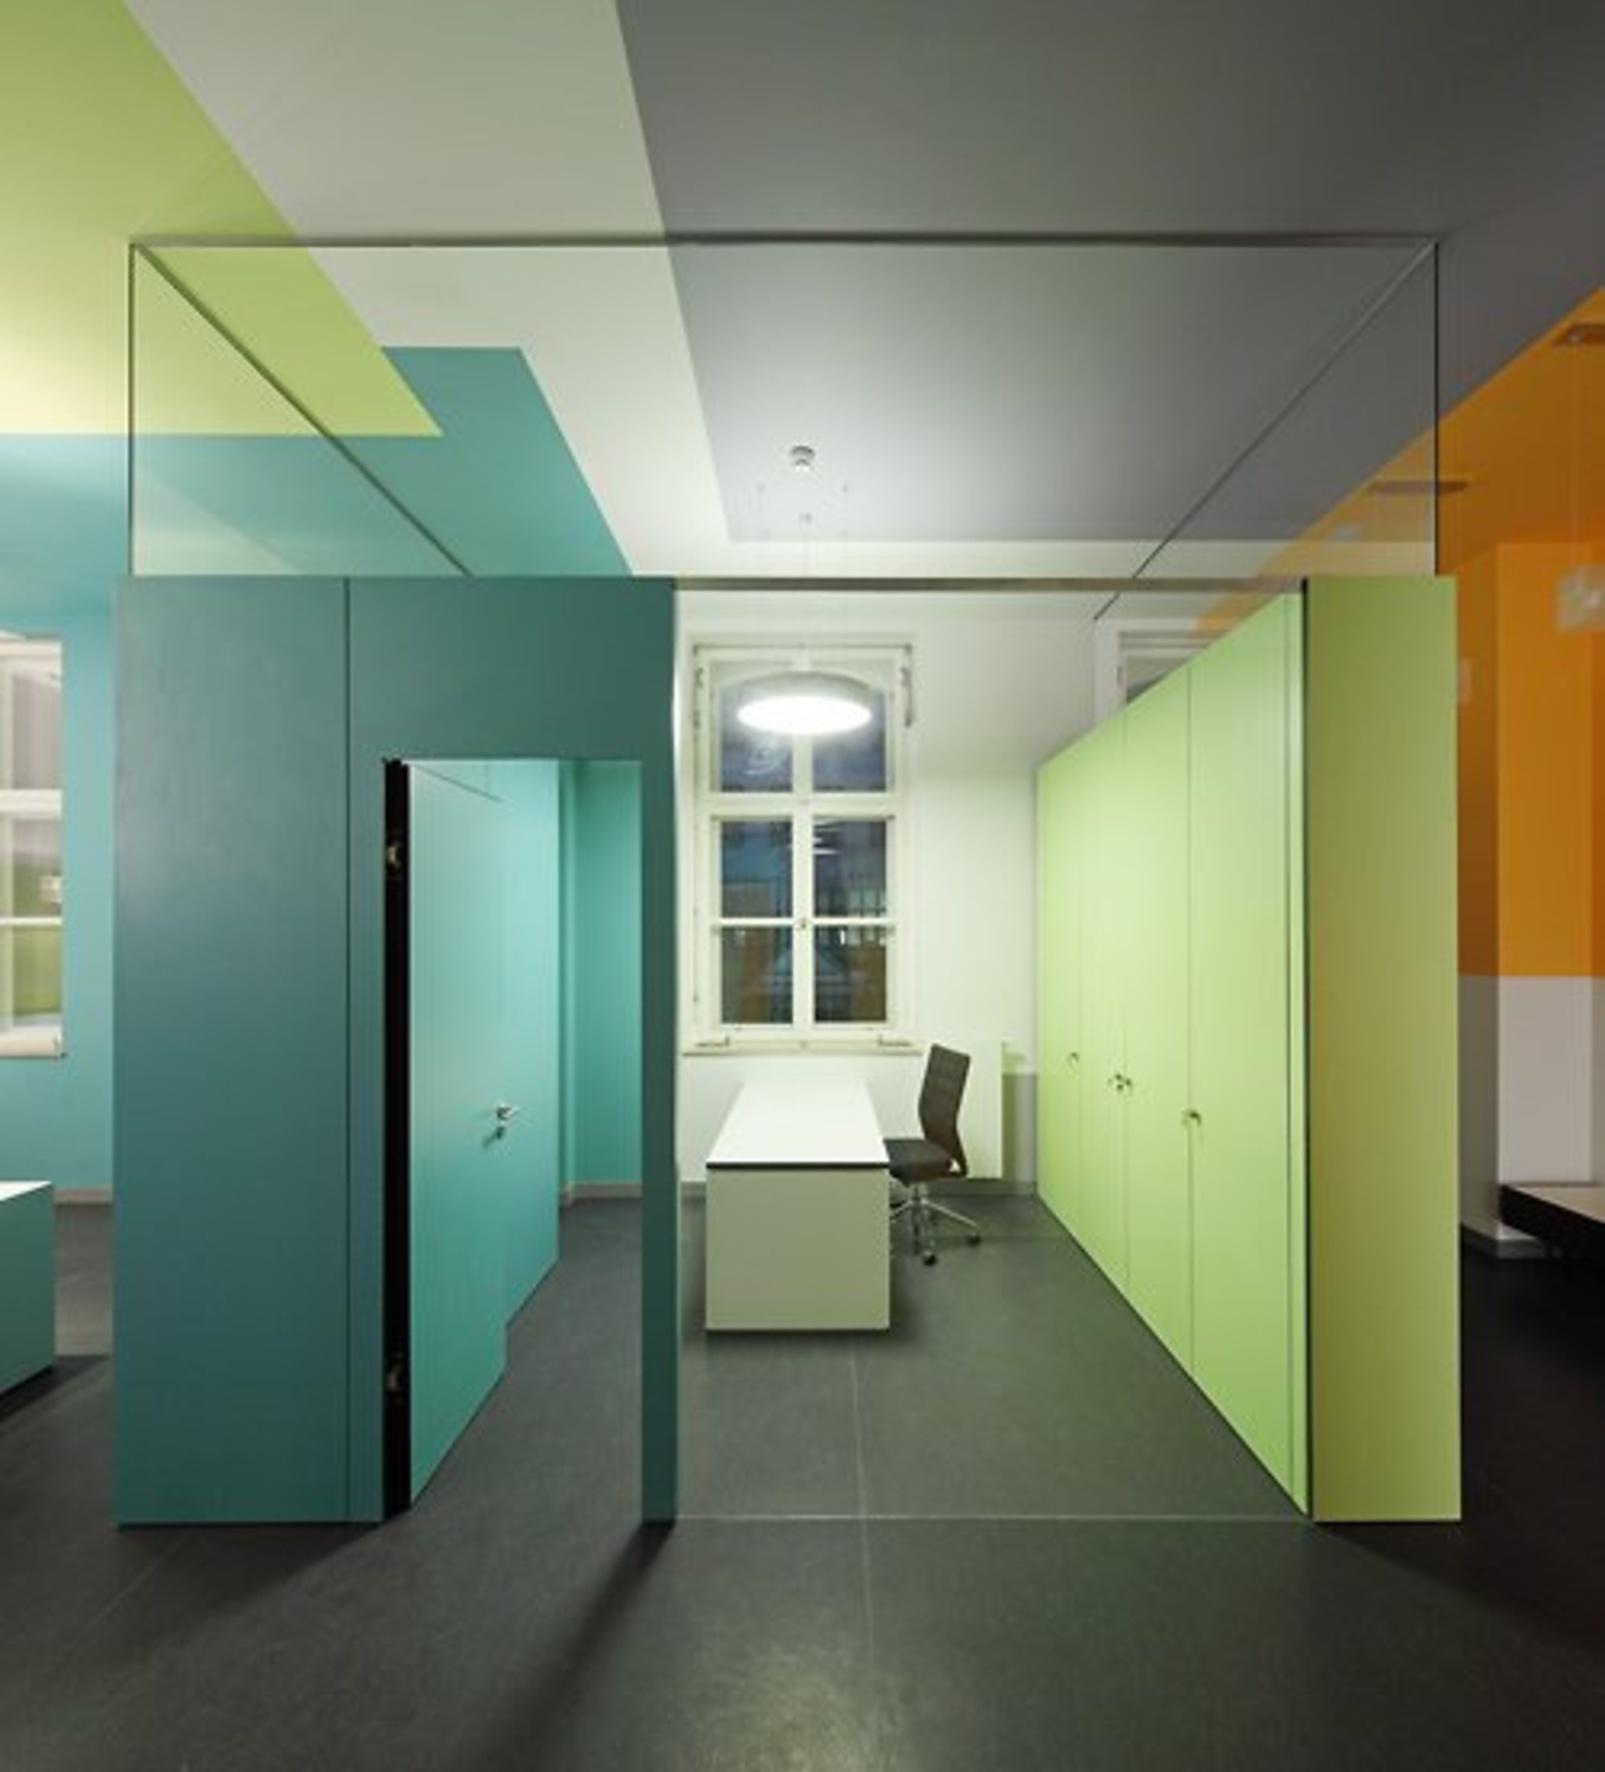 neuer raumfluss durch farbe caparol. Black Bedroom Furniture Sets. Home Design Ideas